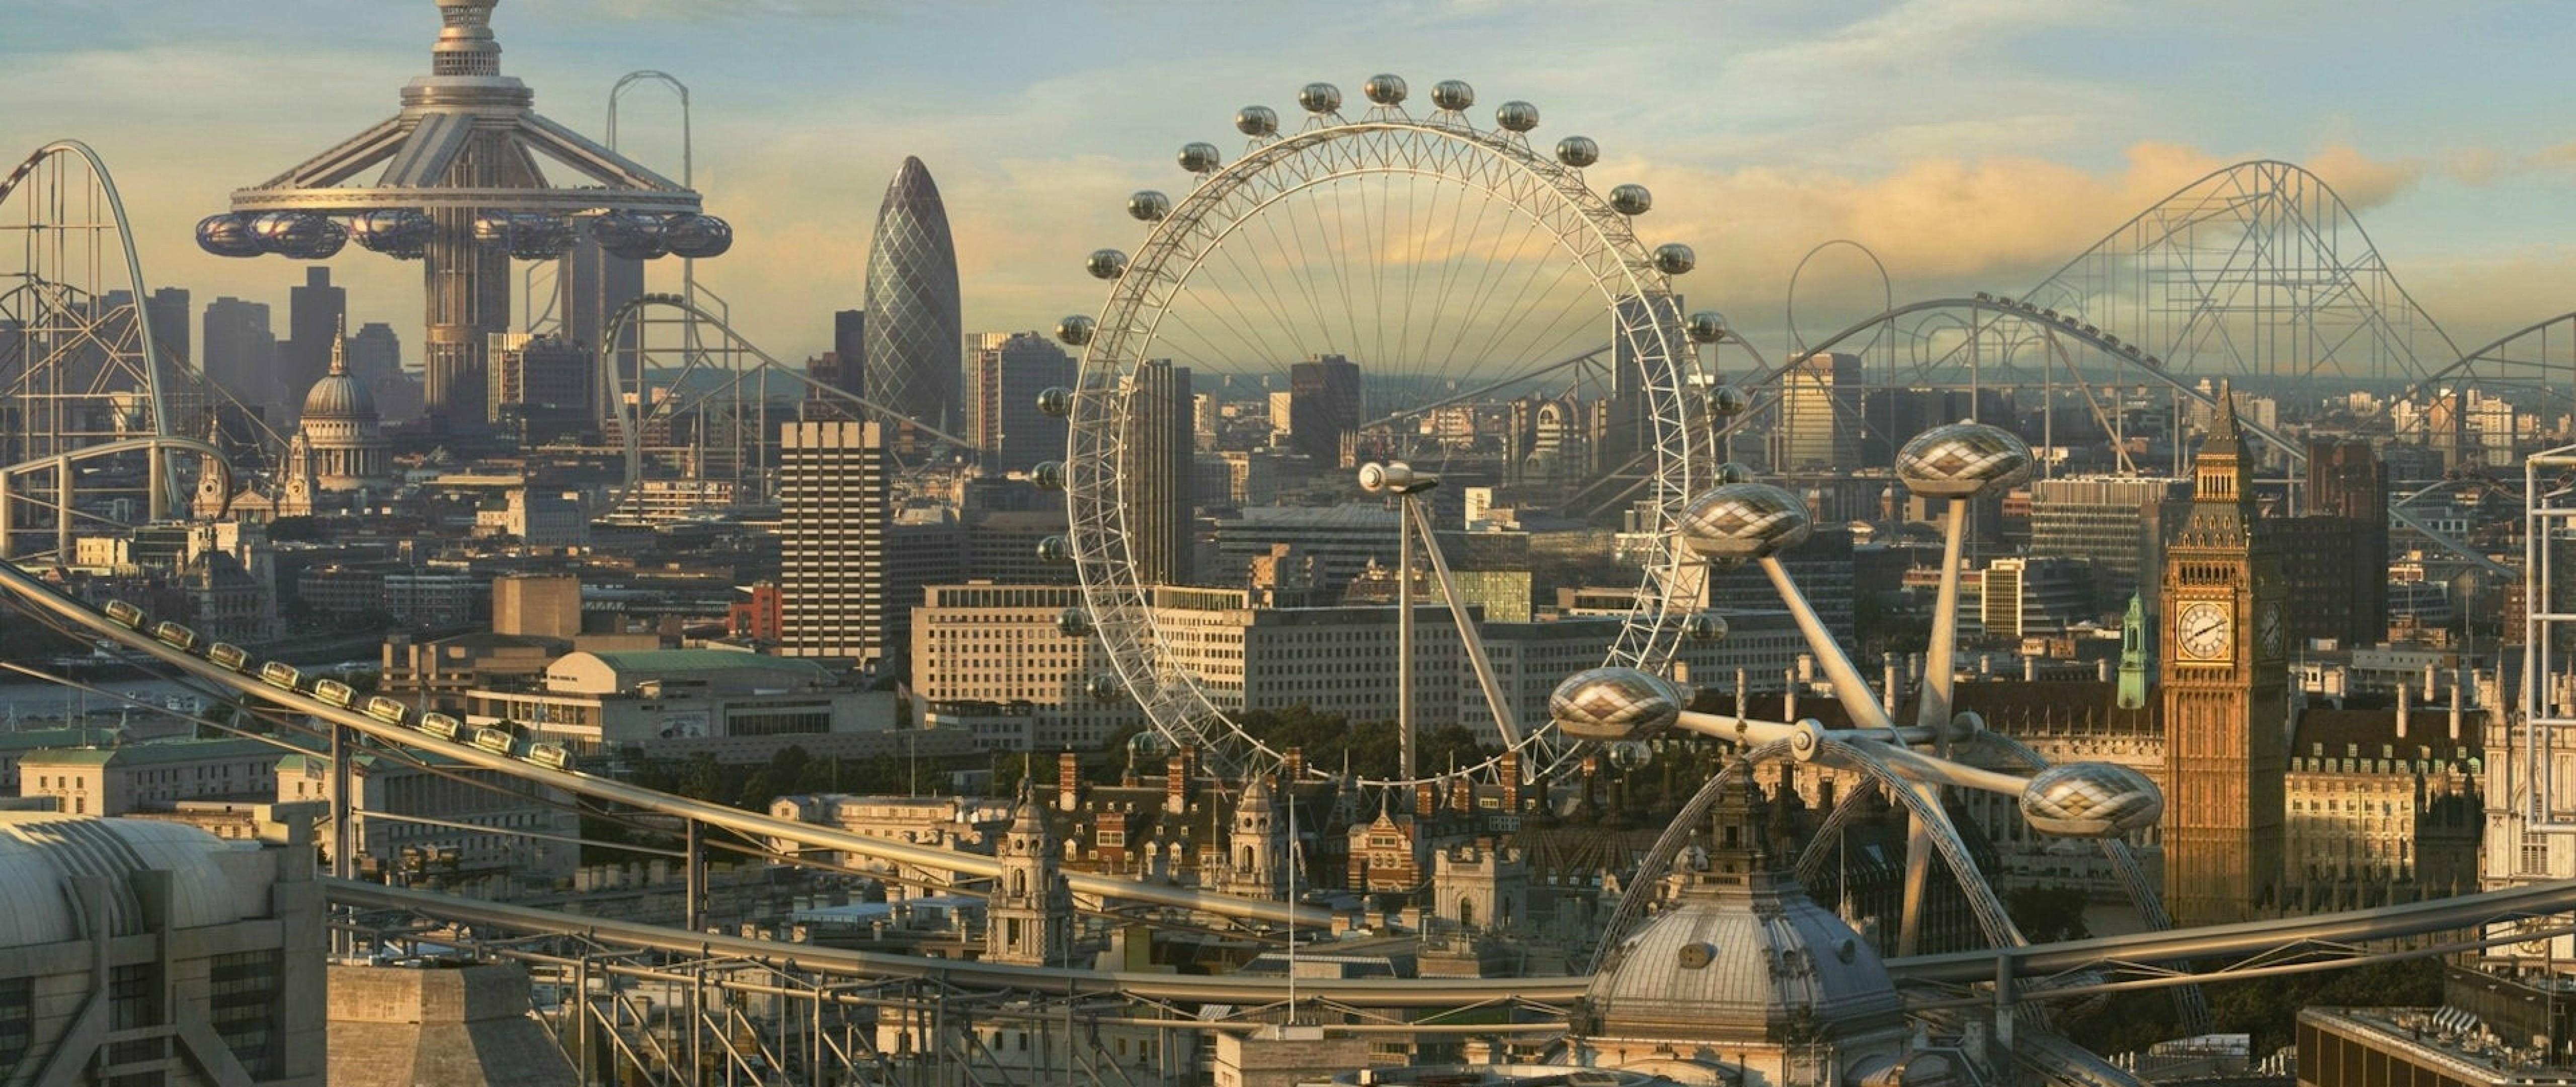 Futuristic London Buildings Hd Wallpaper 4k Ultra Hd Wide Tv